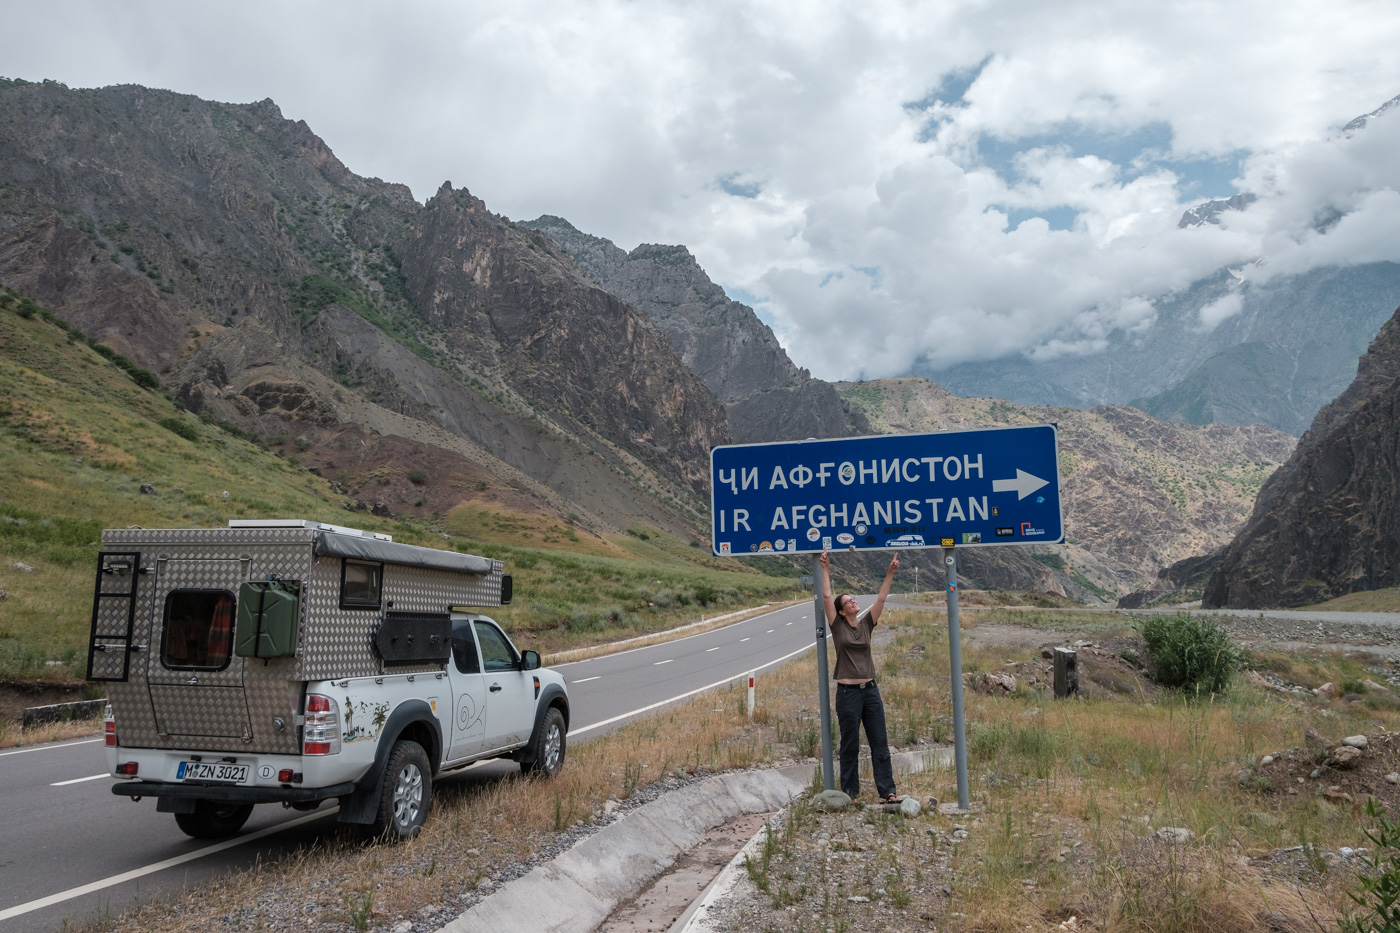 Abenteuer Pamir Highway - Wegweiser nach Afghanistan.